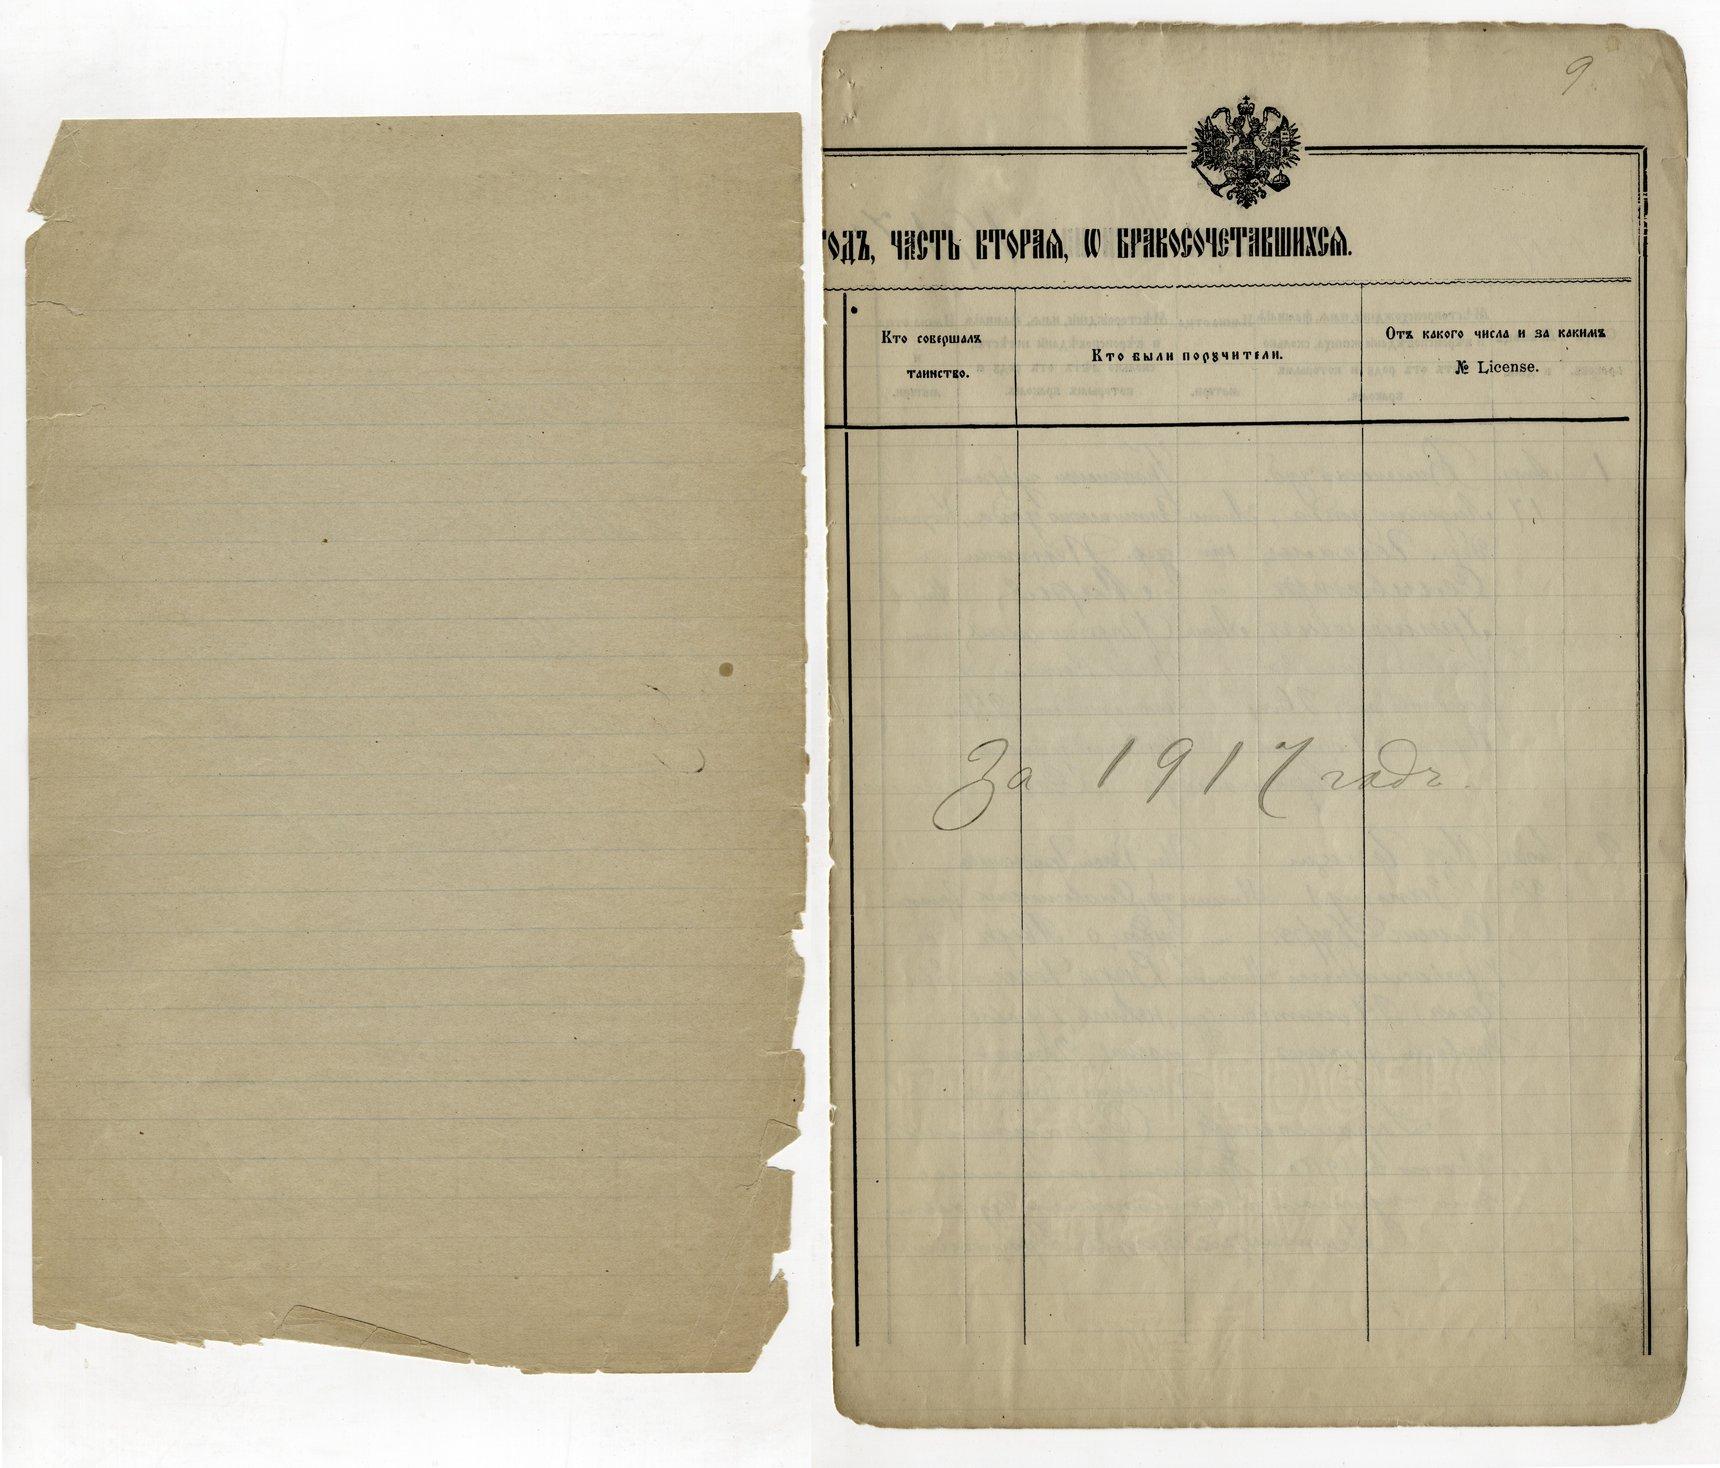 Birth, marriage and death register, Holy Trinity Russian Orthodox Church, Kansas City, Kansas - 1917 - 009 - Marriage